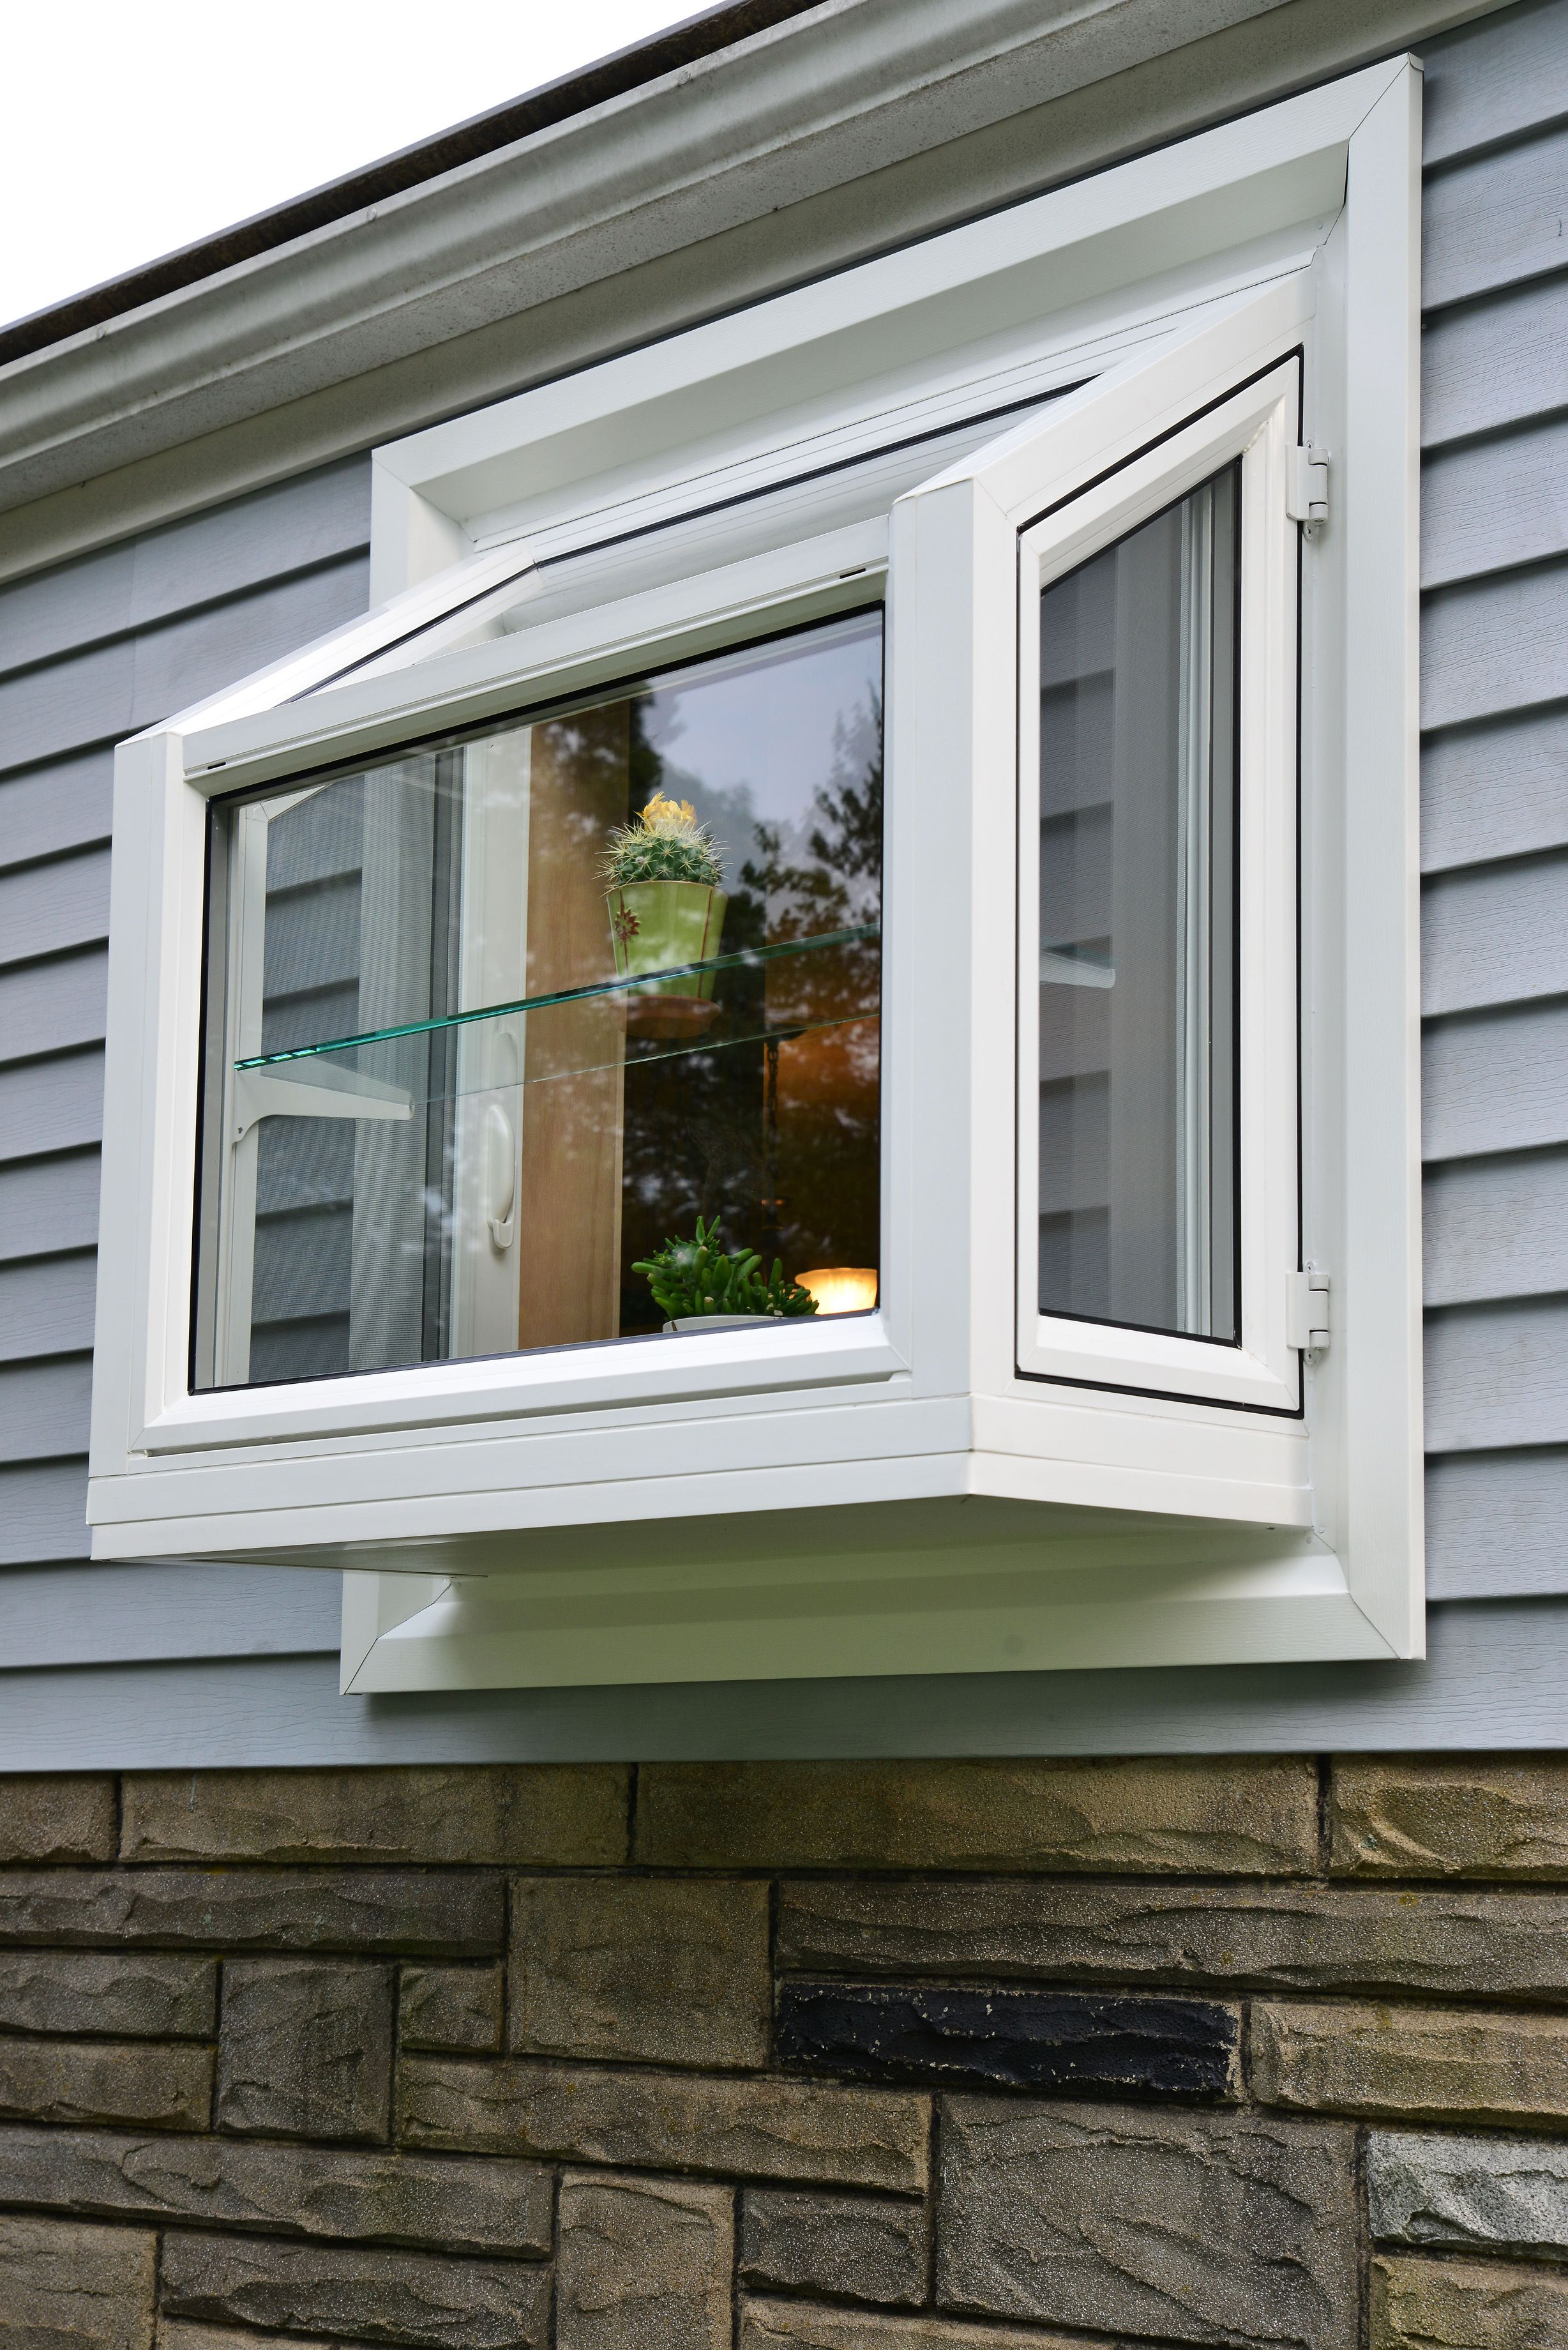 Small Garden Window Over The Kitchen Sink Exterior View